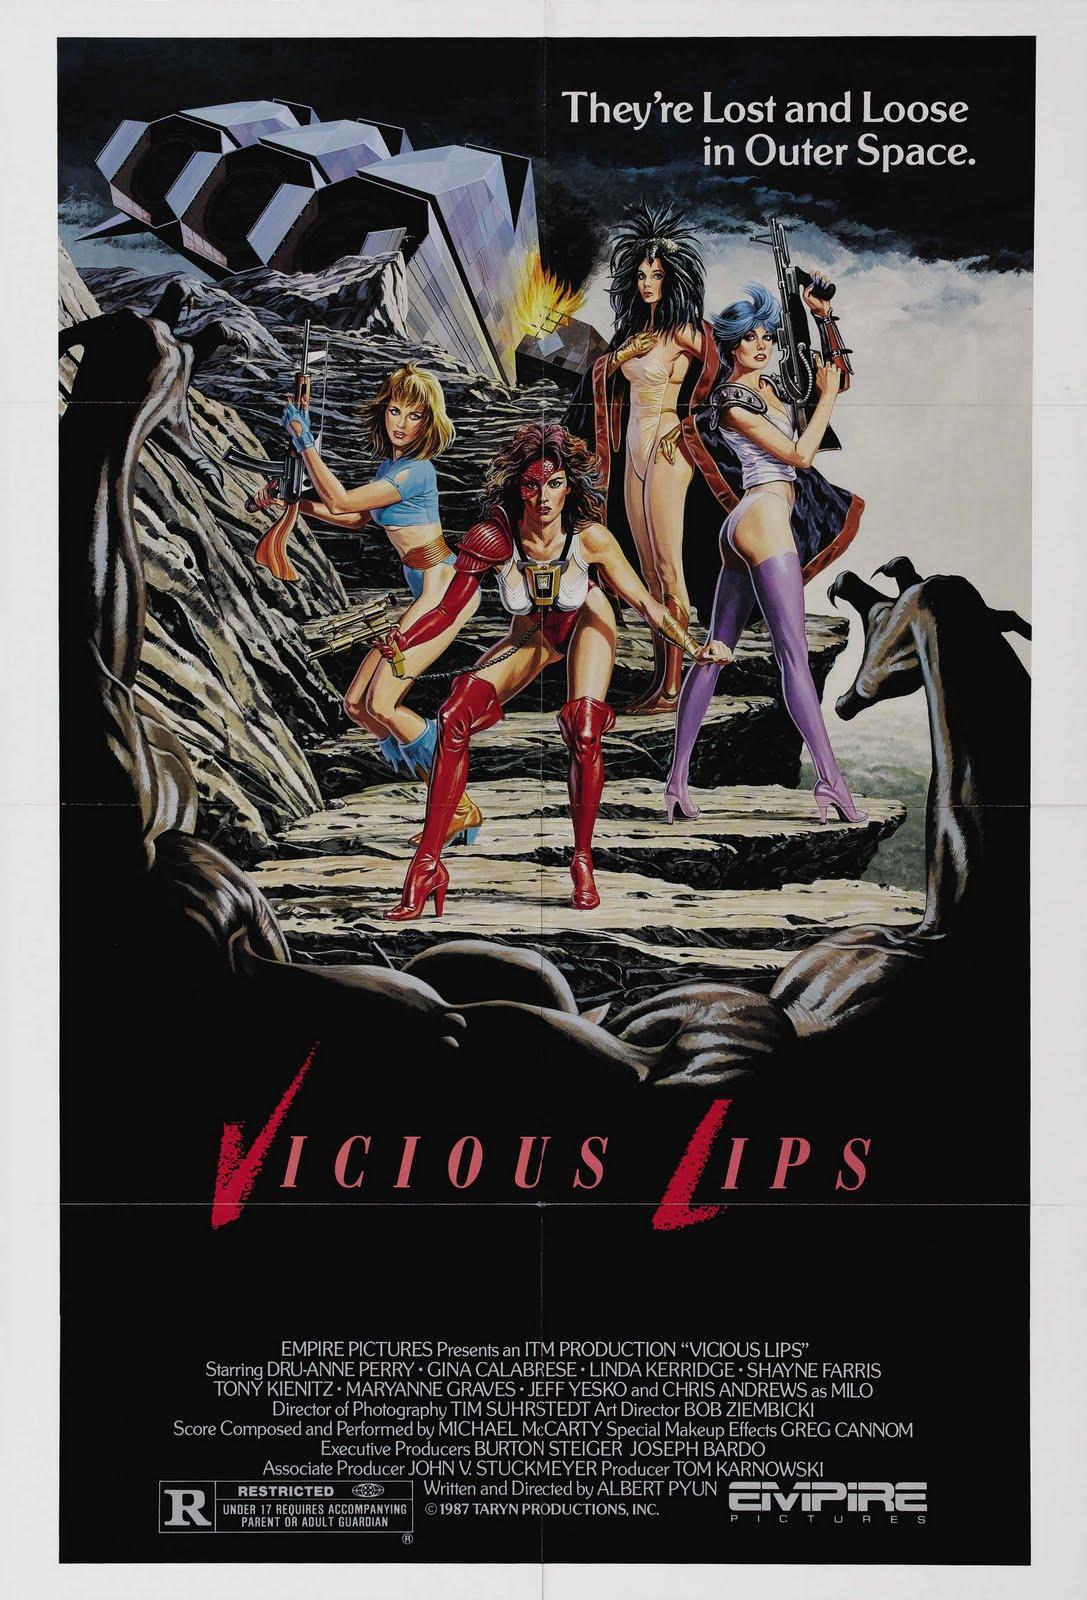 http://4.bp.blogspot.com/-IqVhwgZlqok/TgD0Y5-6P3I/AAAAAAAAA8A/mBdslA7-yI0/s1600/vicious_lips_poster_01.jpg